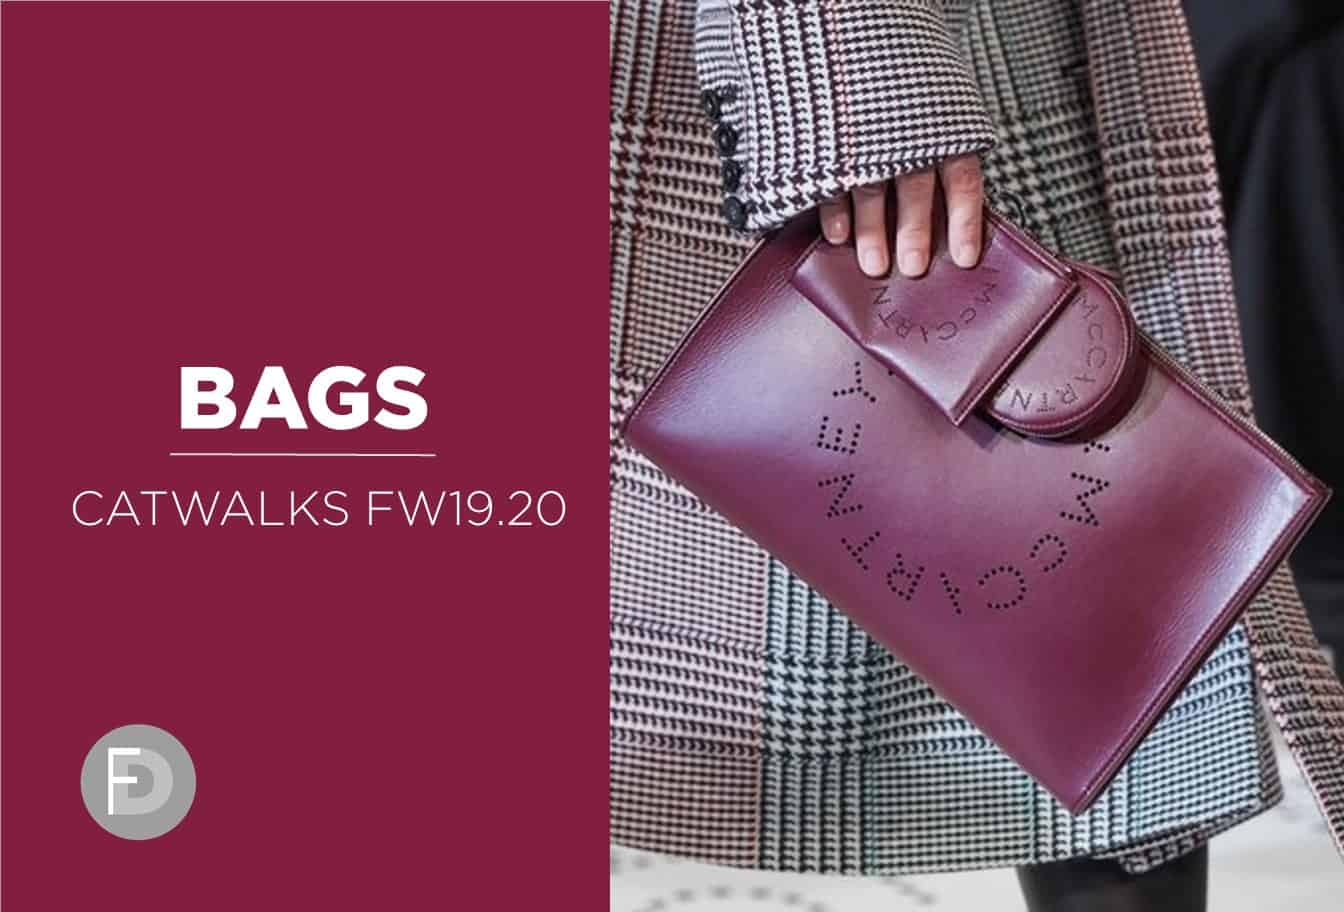 Bags Fw19.20